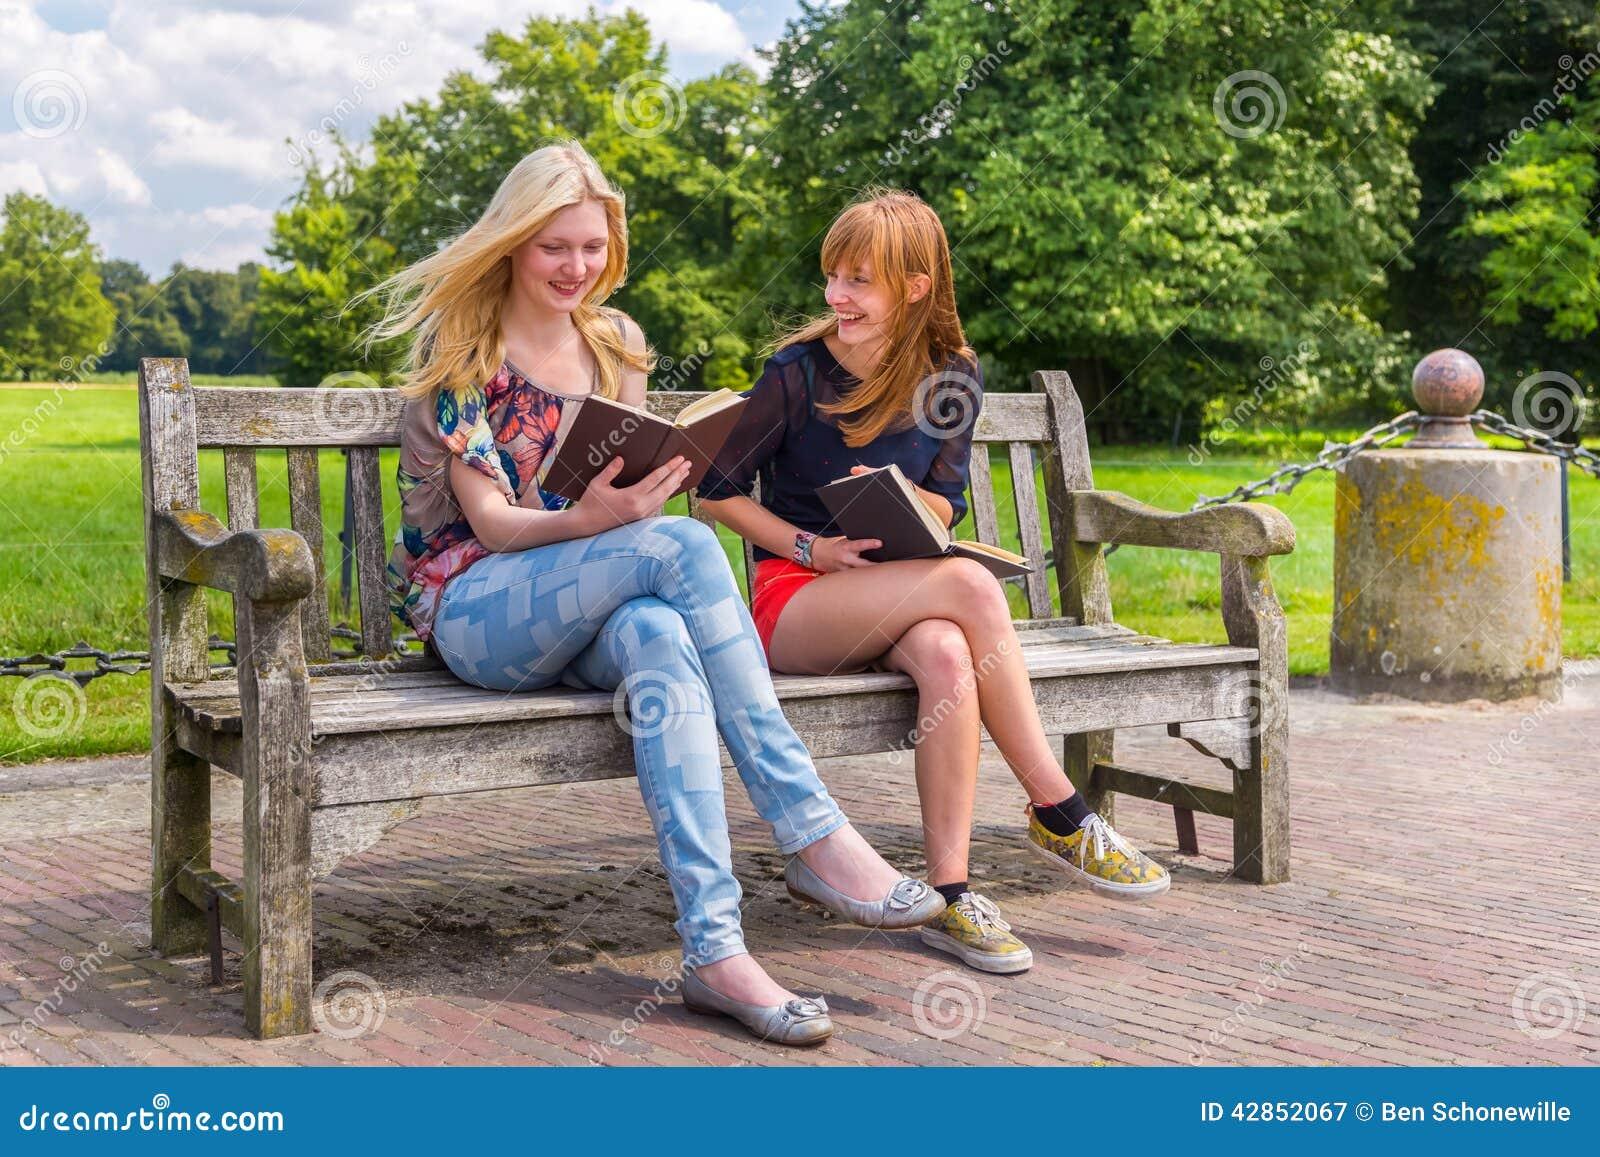 Girls Sitting On Wooden Bench In Park Reading Books Stock